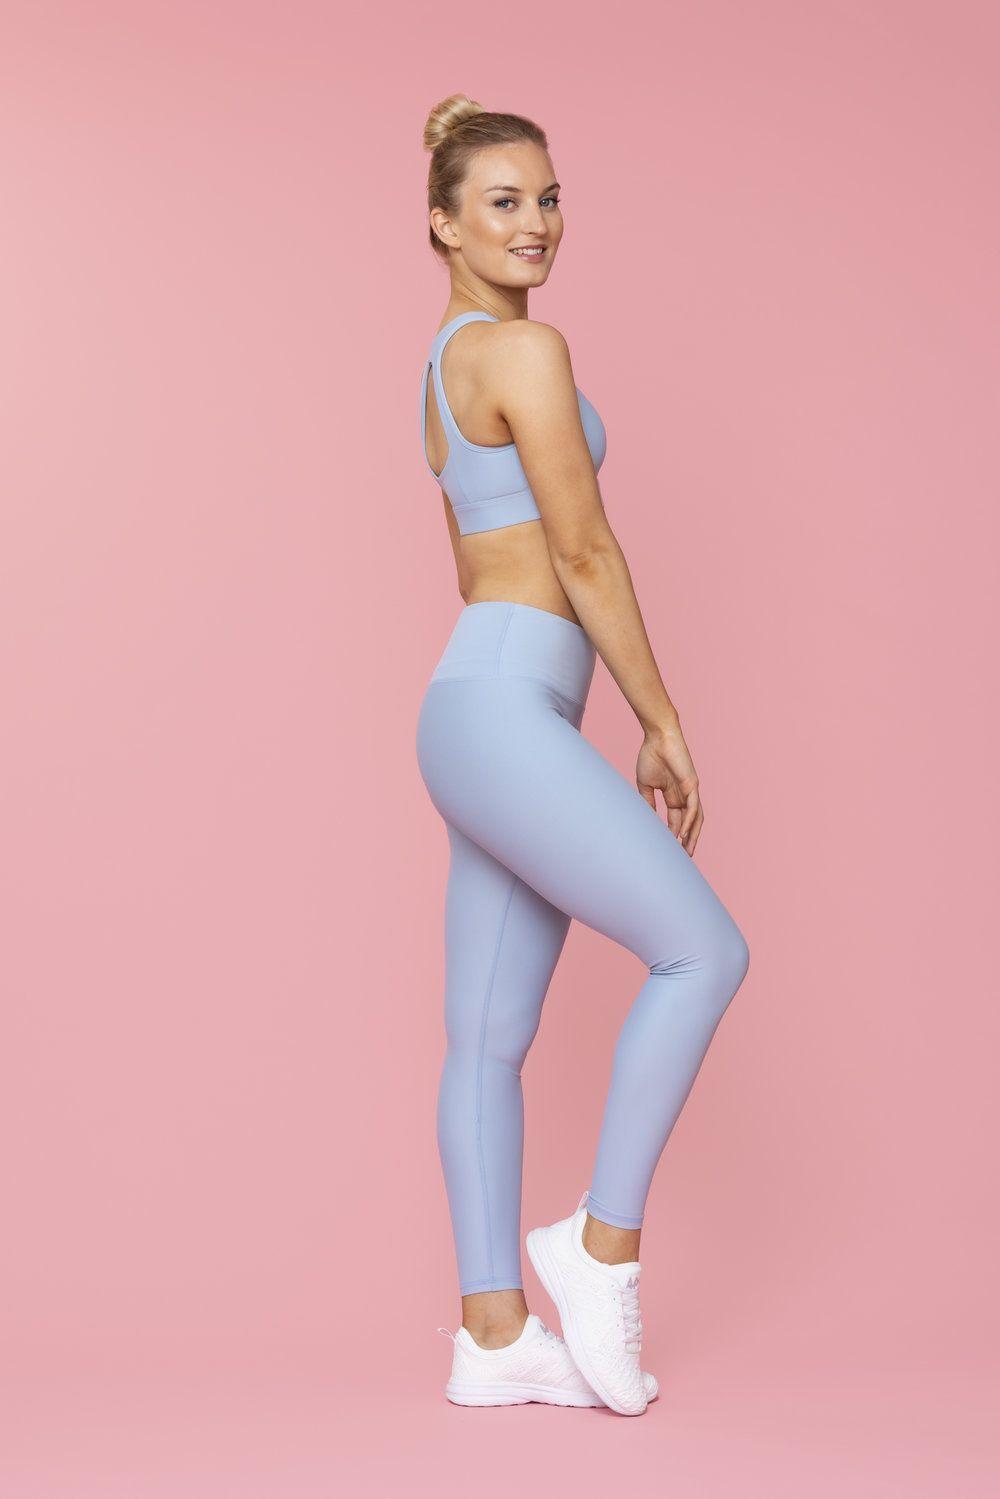 Skimmed Milk, yoga, sport, fashion